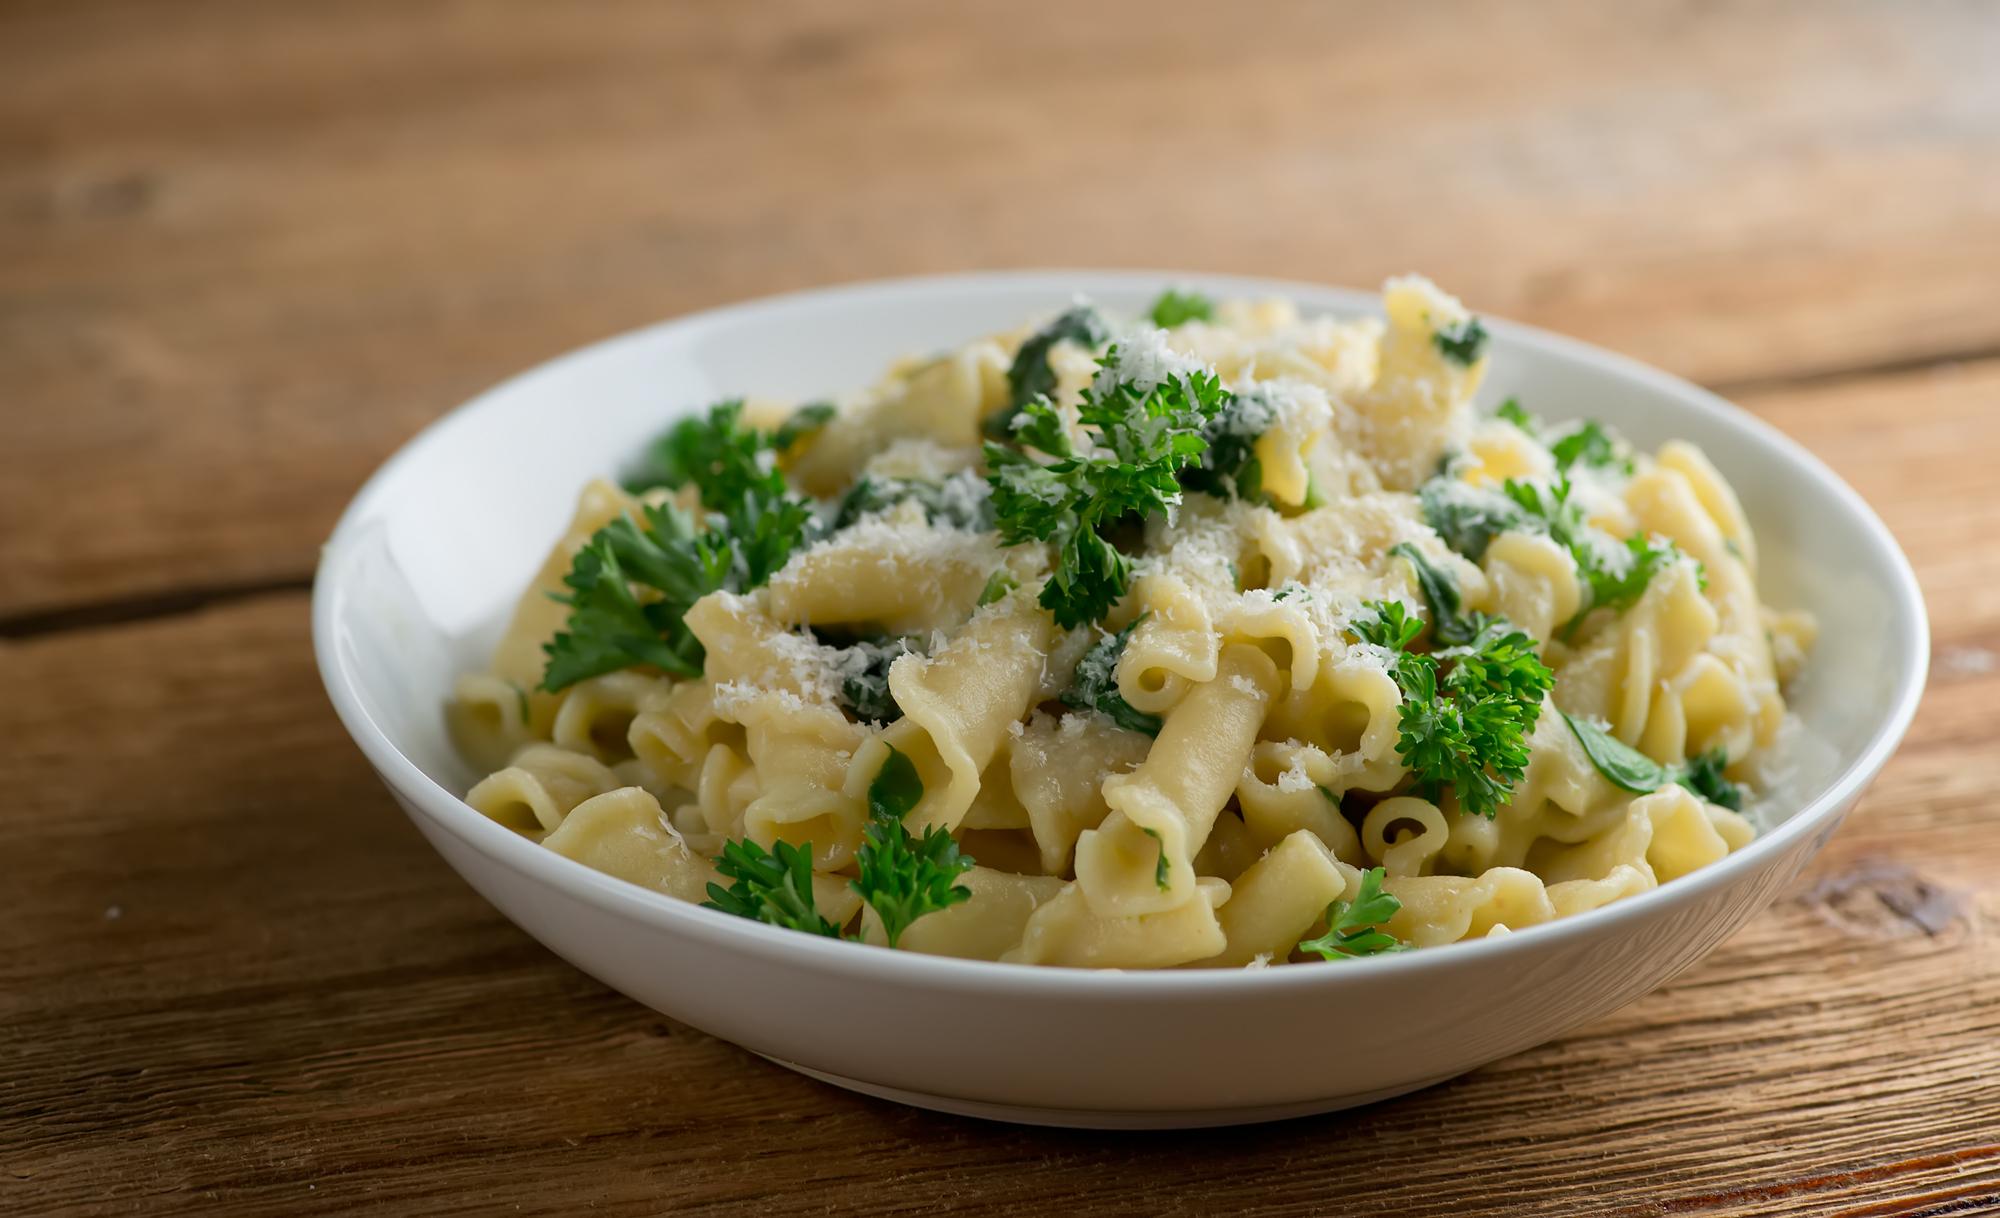 pasta with creamy spinach hummus sauce